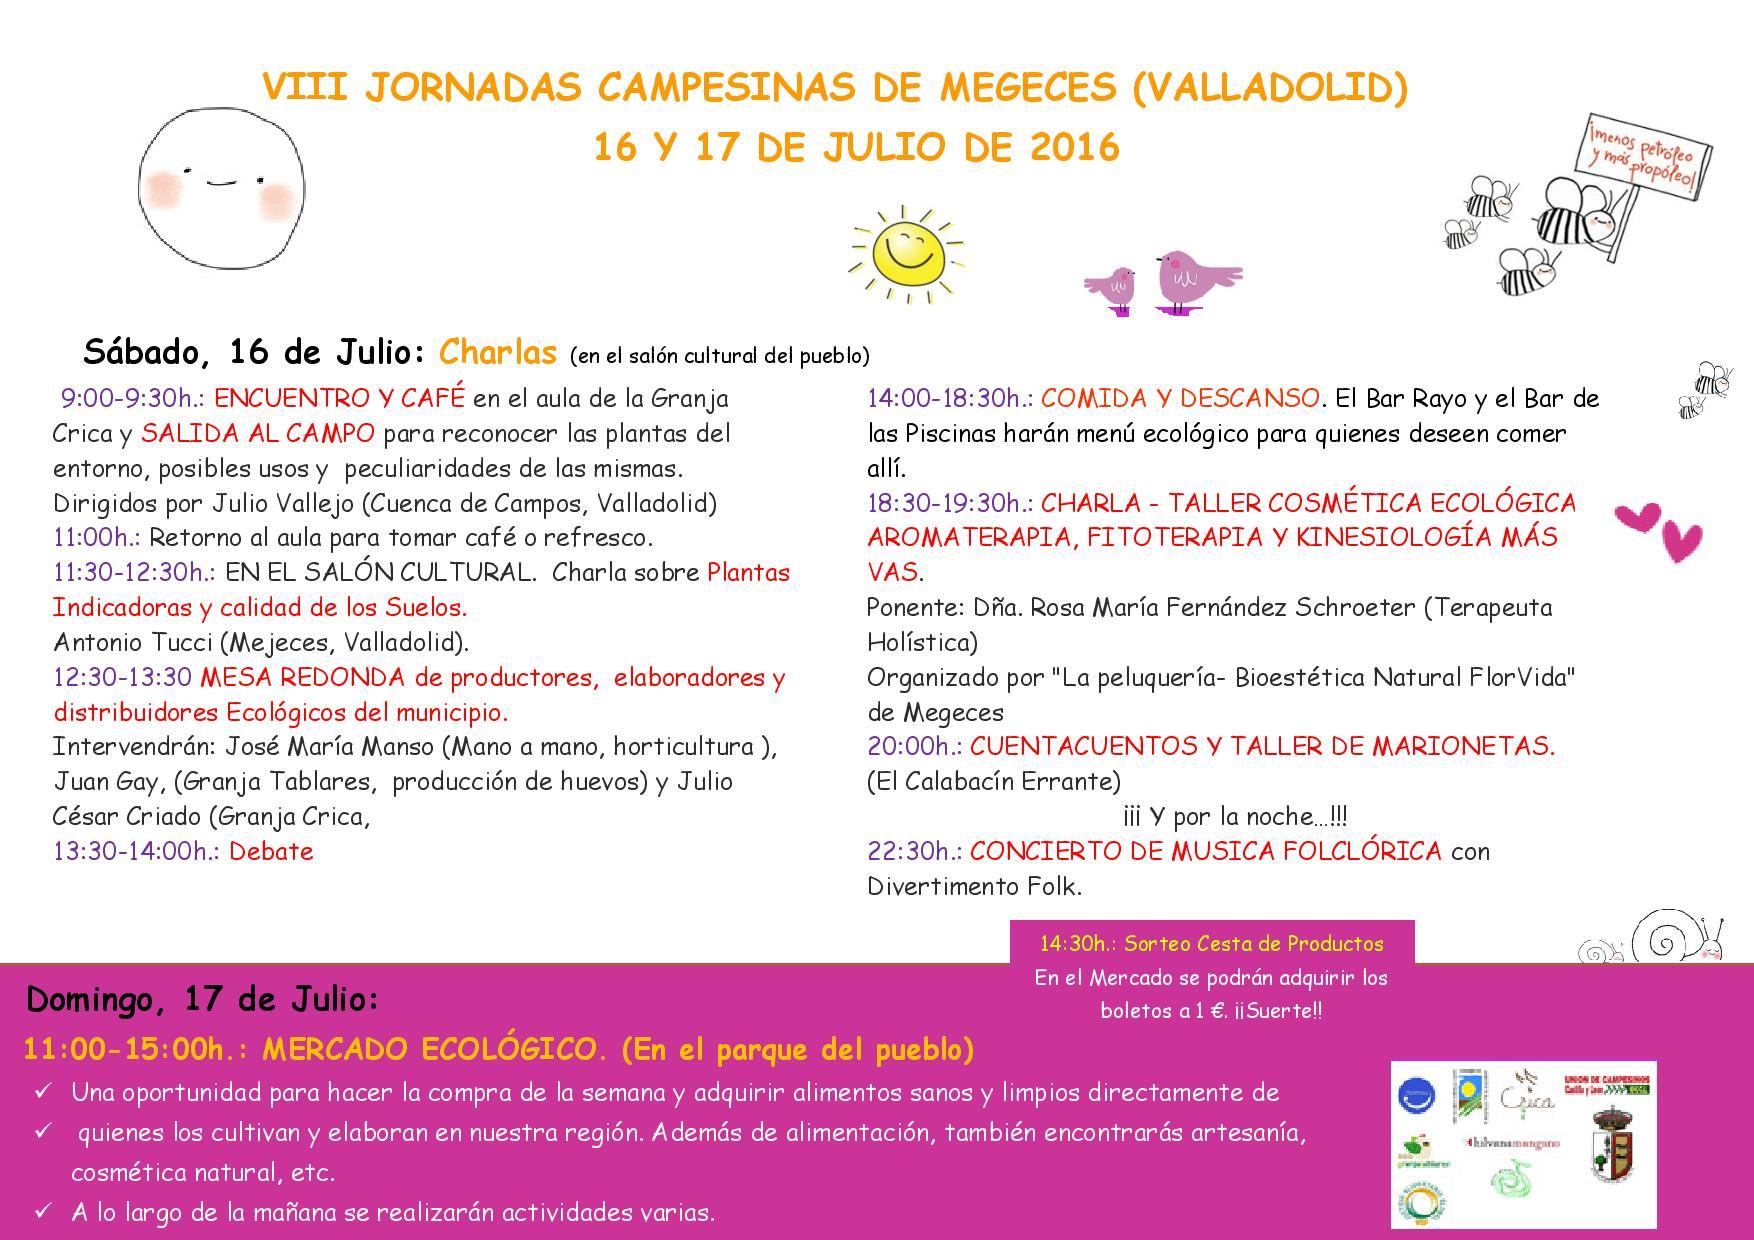 VIII JORNADAS CAMPESINAS DE MEGECES 3-page-001